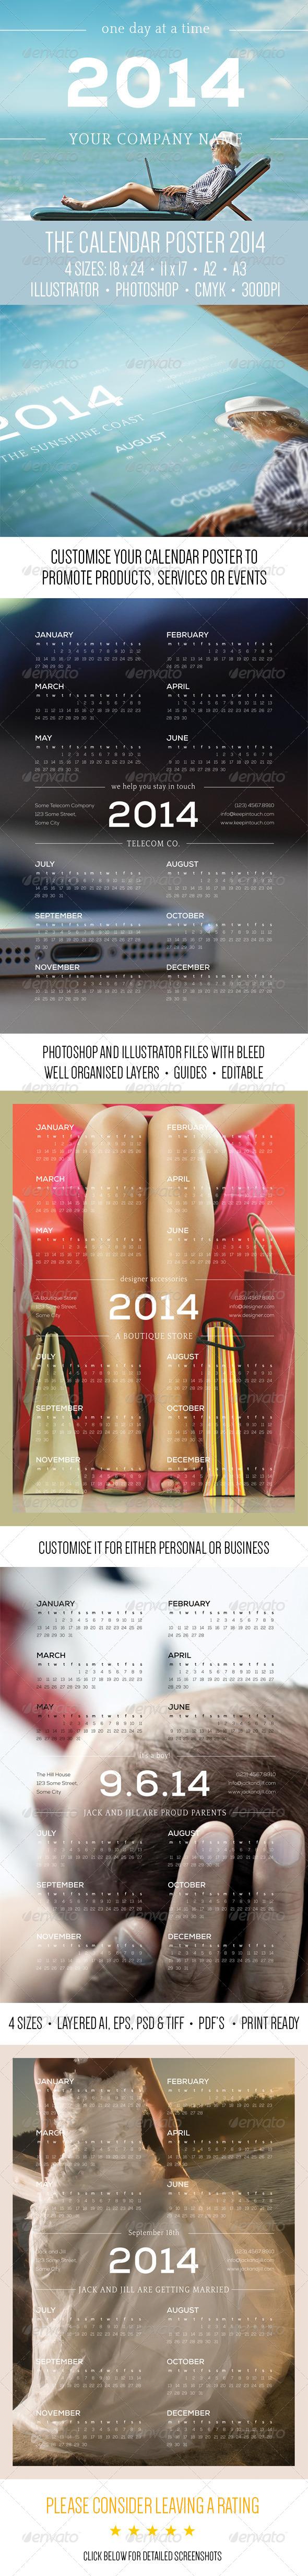 The Calendar Poster 2014